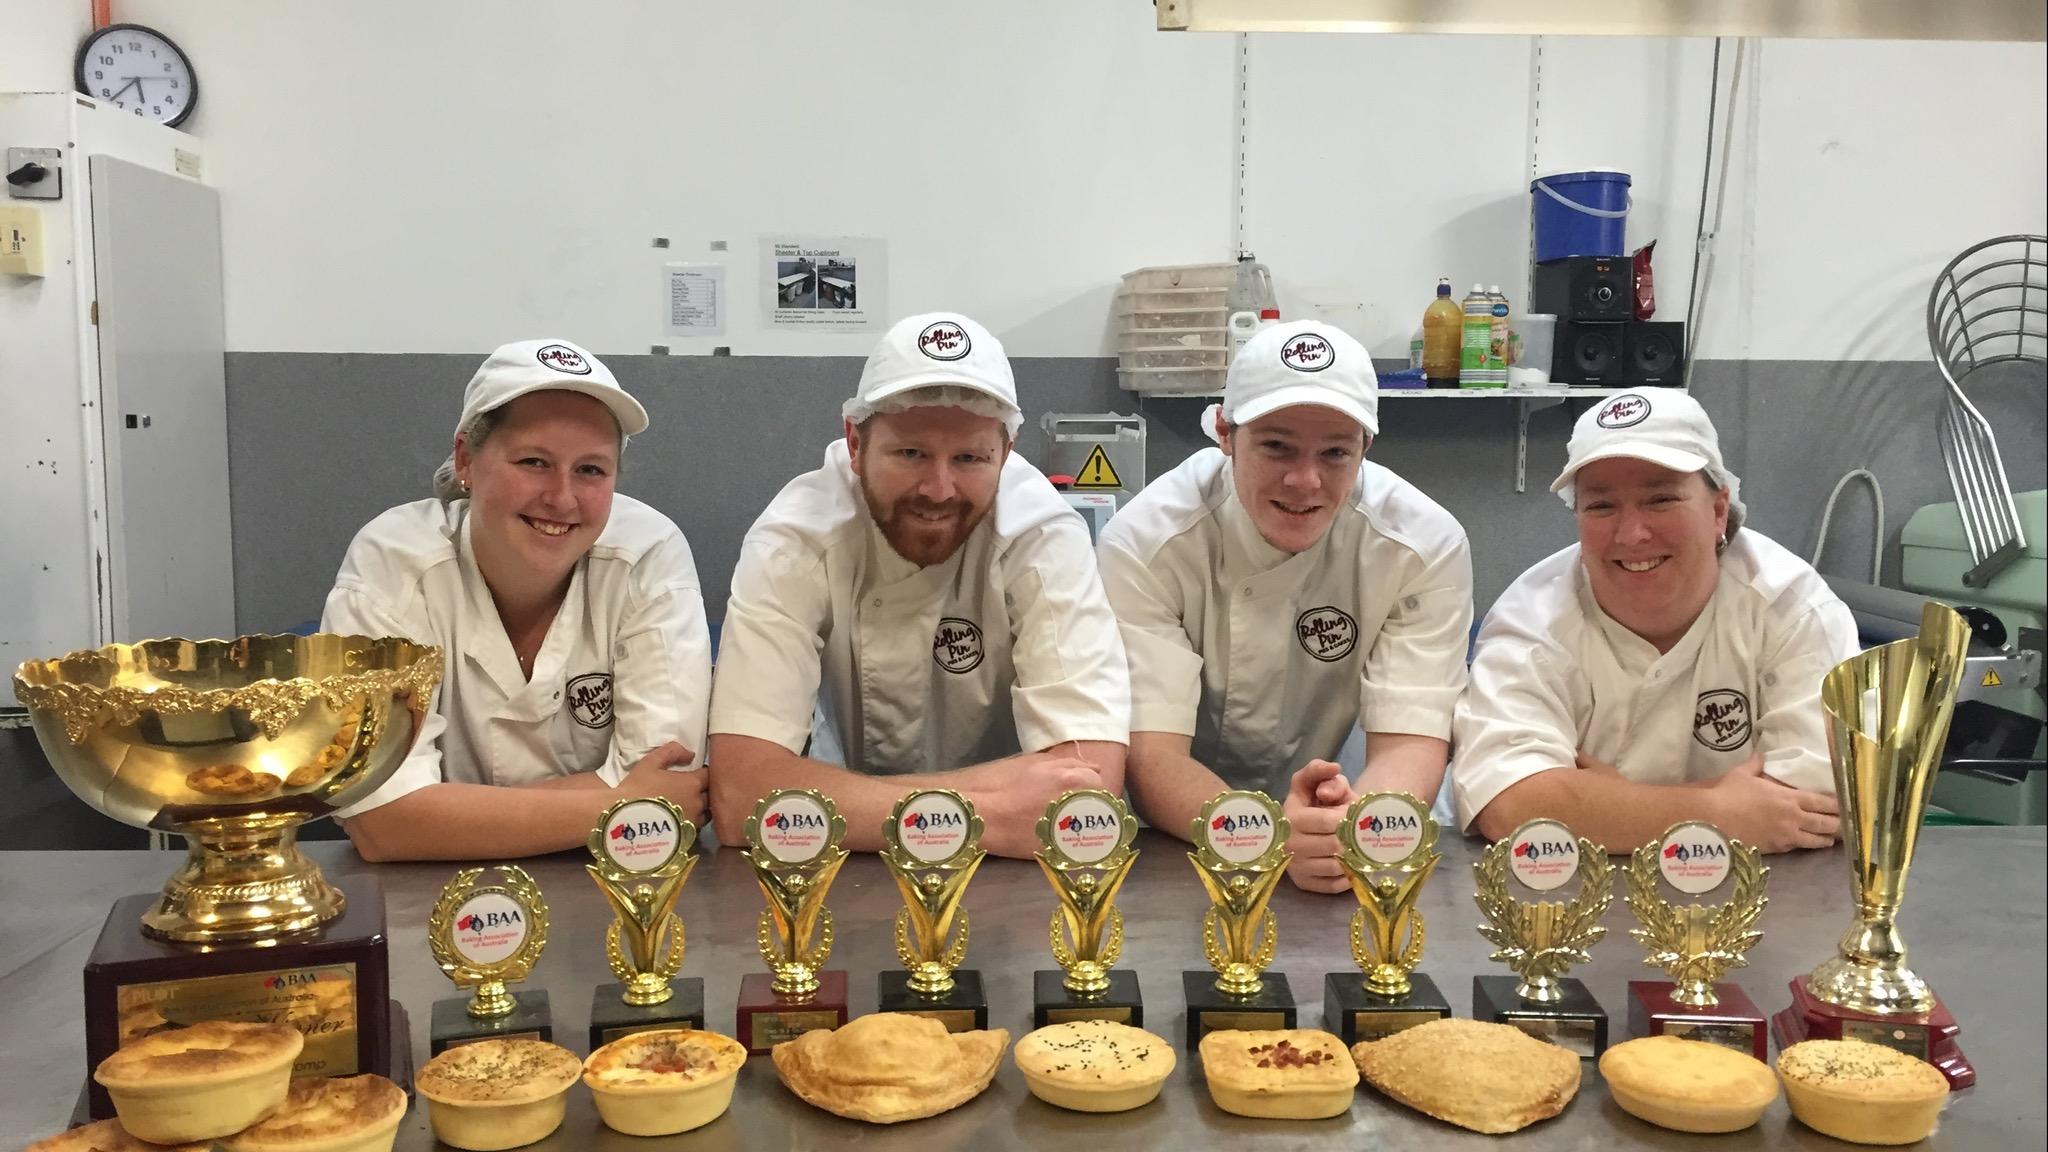 Bakers w/ trophies